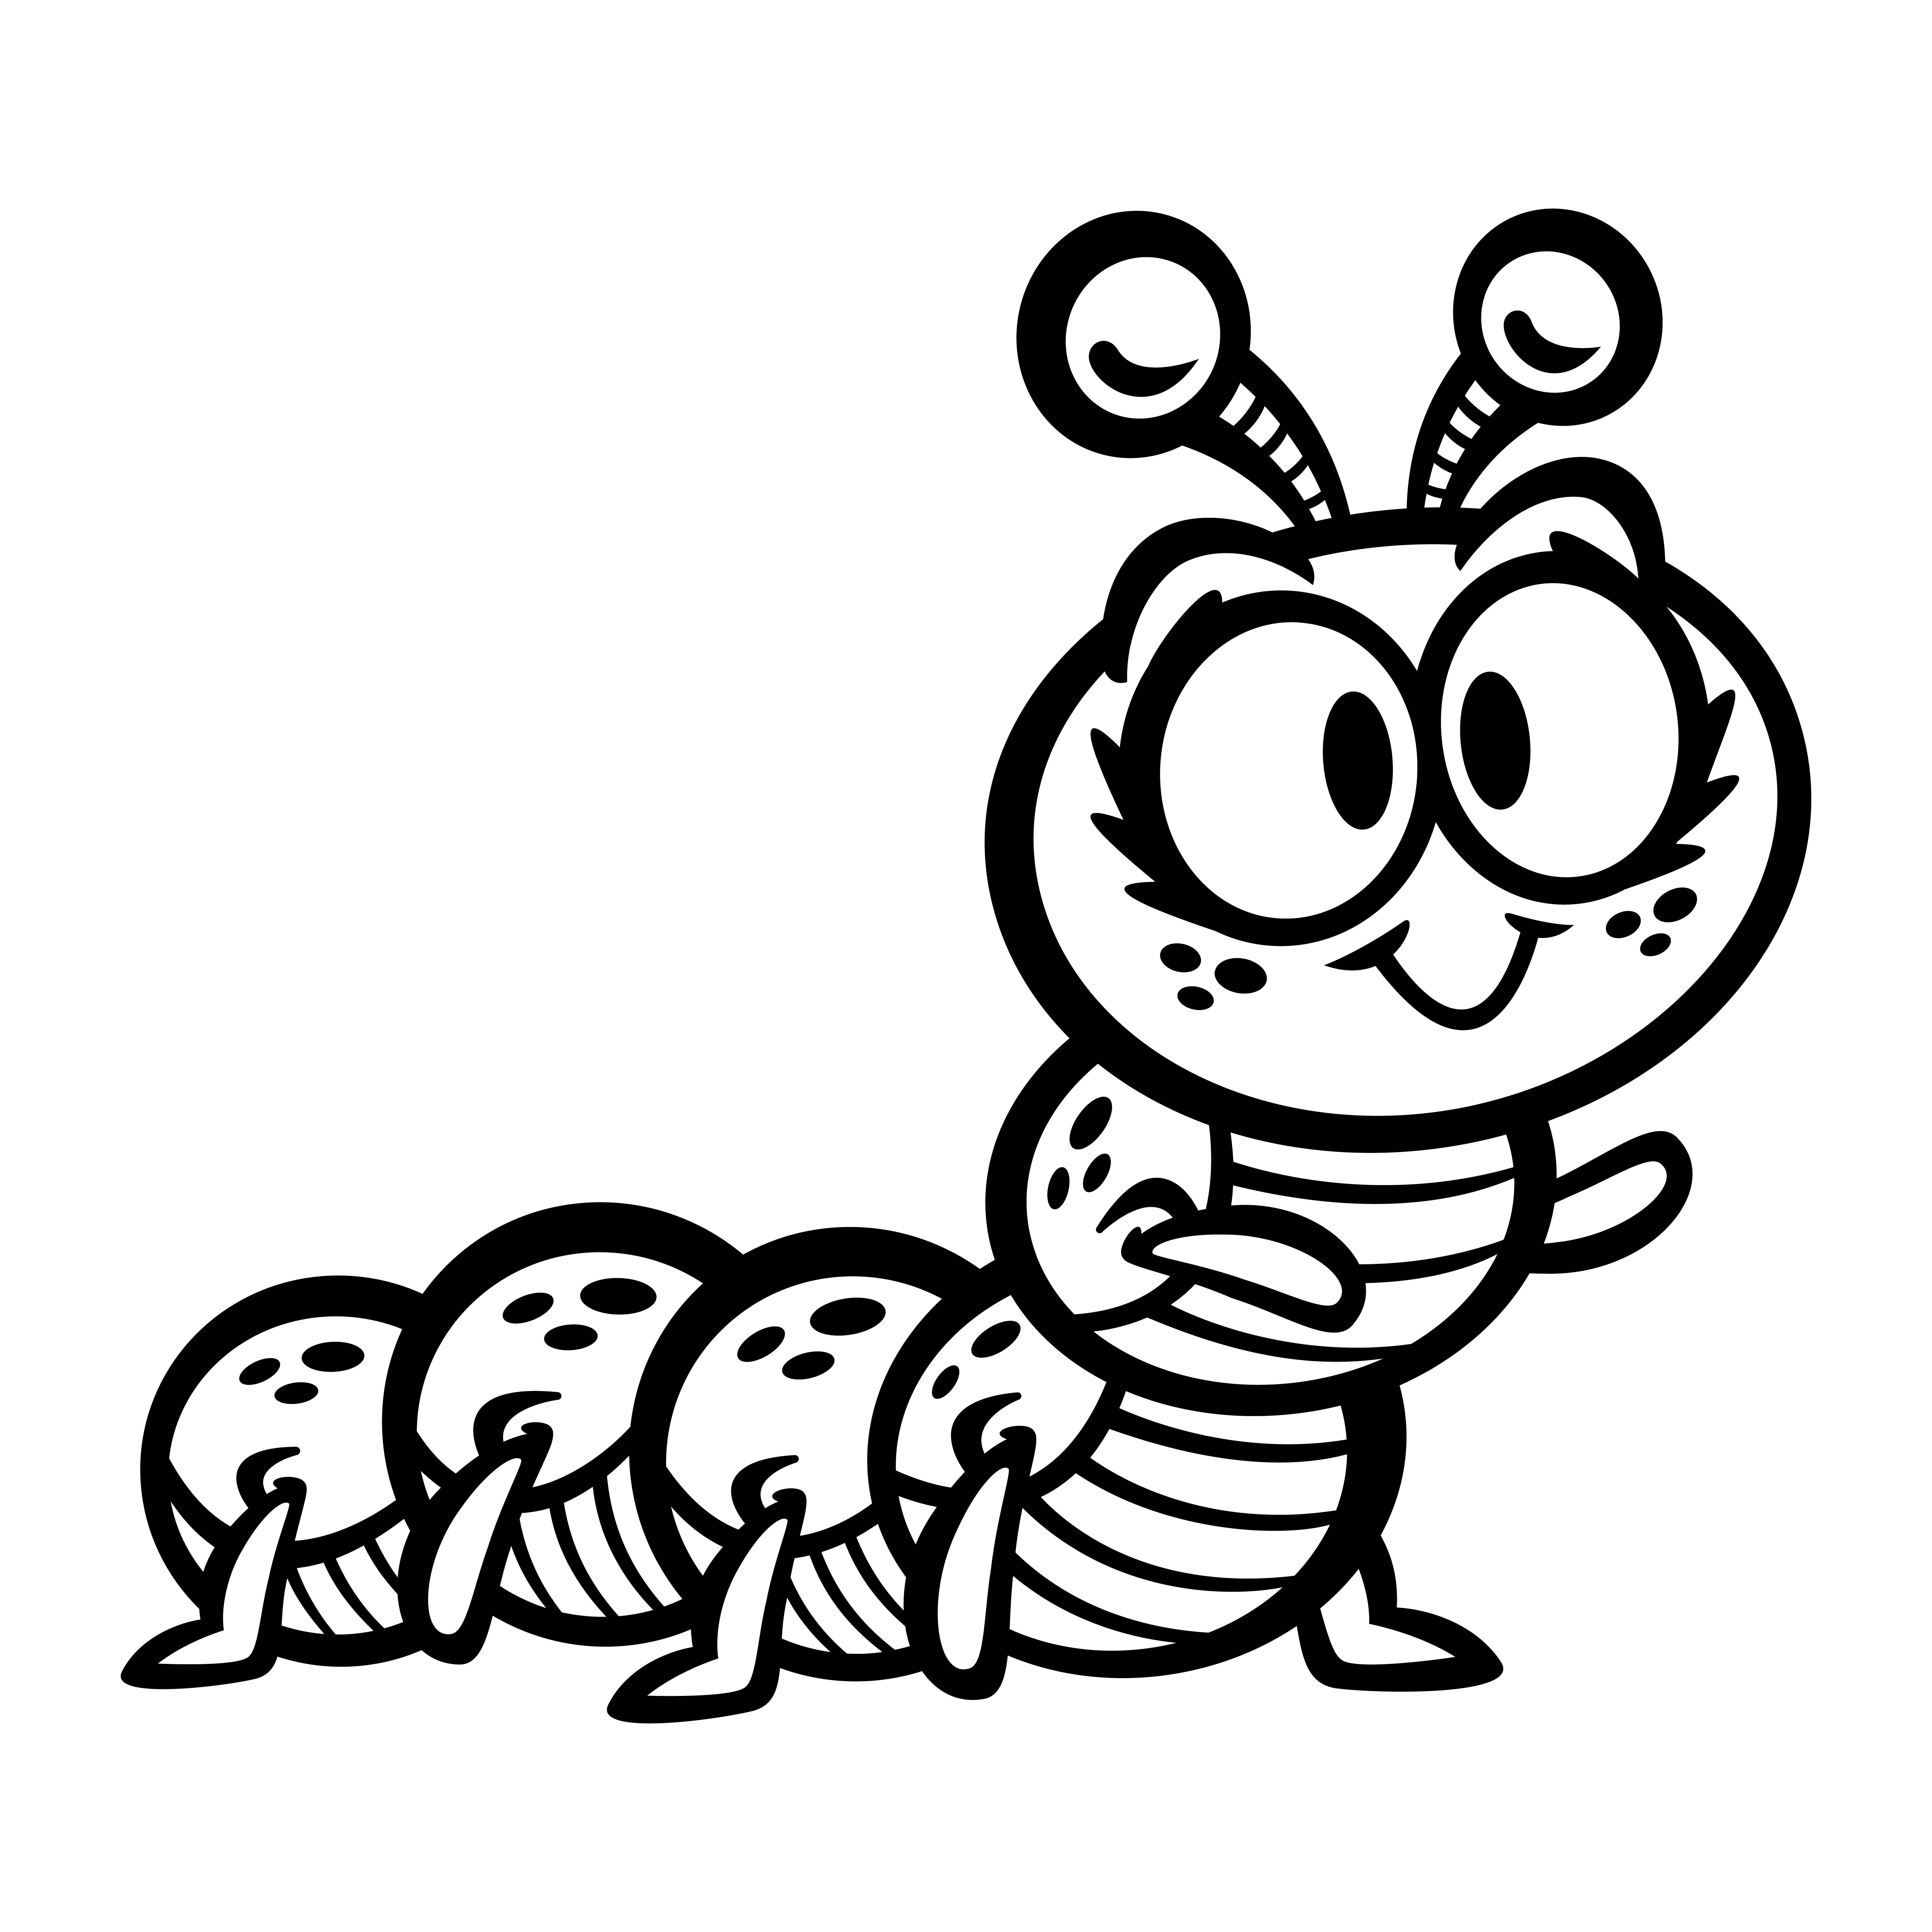 Cute Caterpillar Black And White Clipart - Clipart Suggest |Cute Caterpillar Clipart Black And White